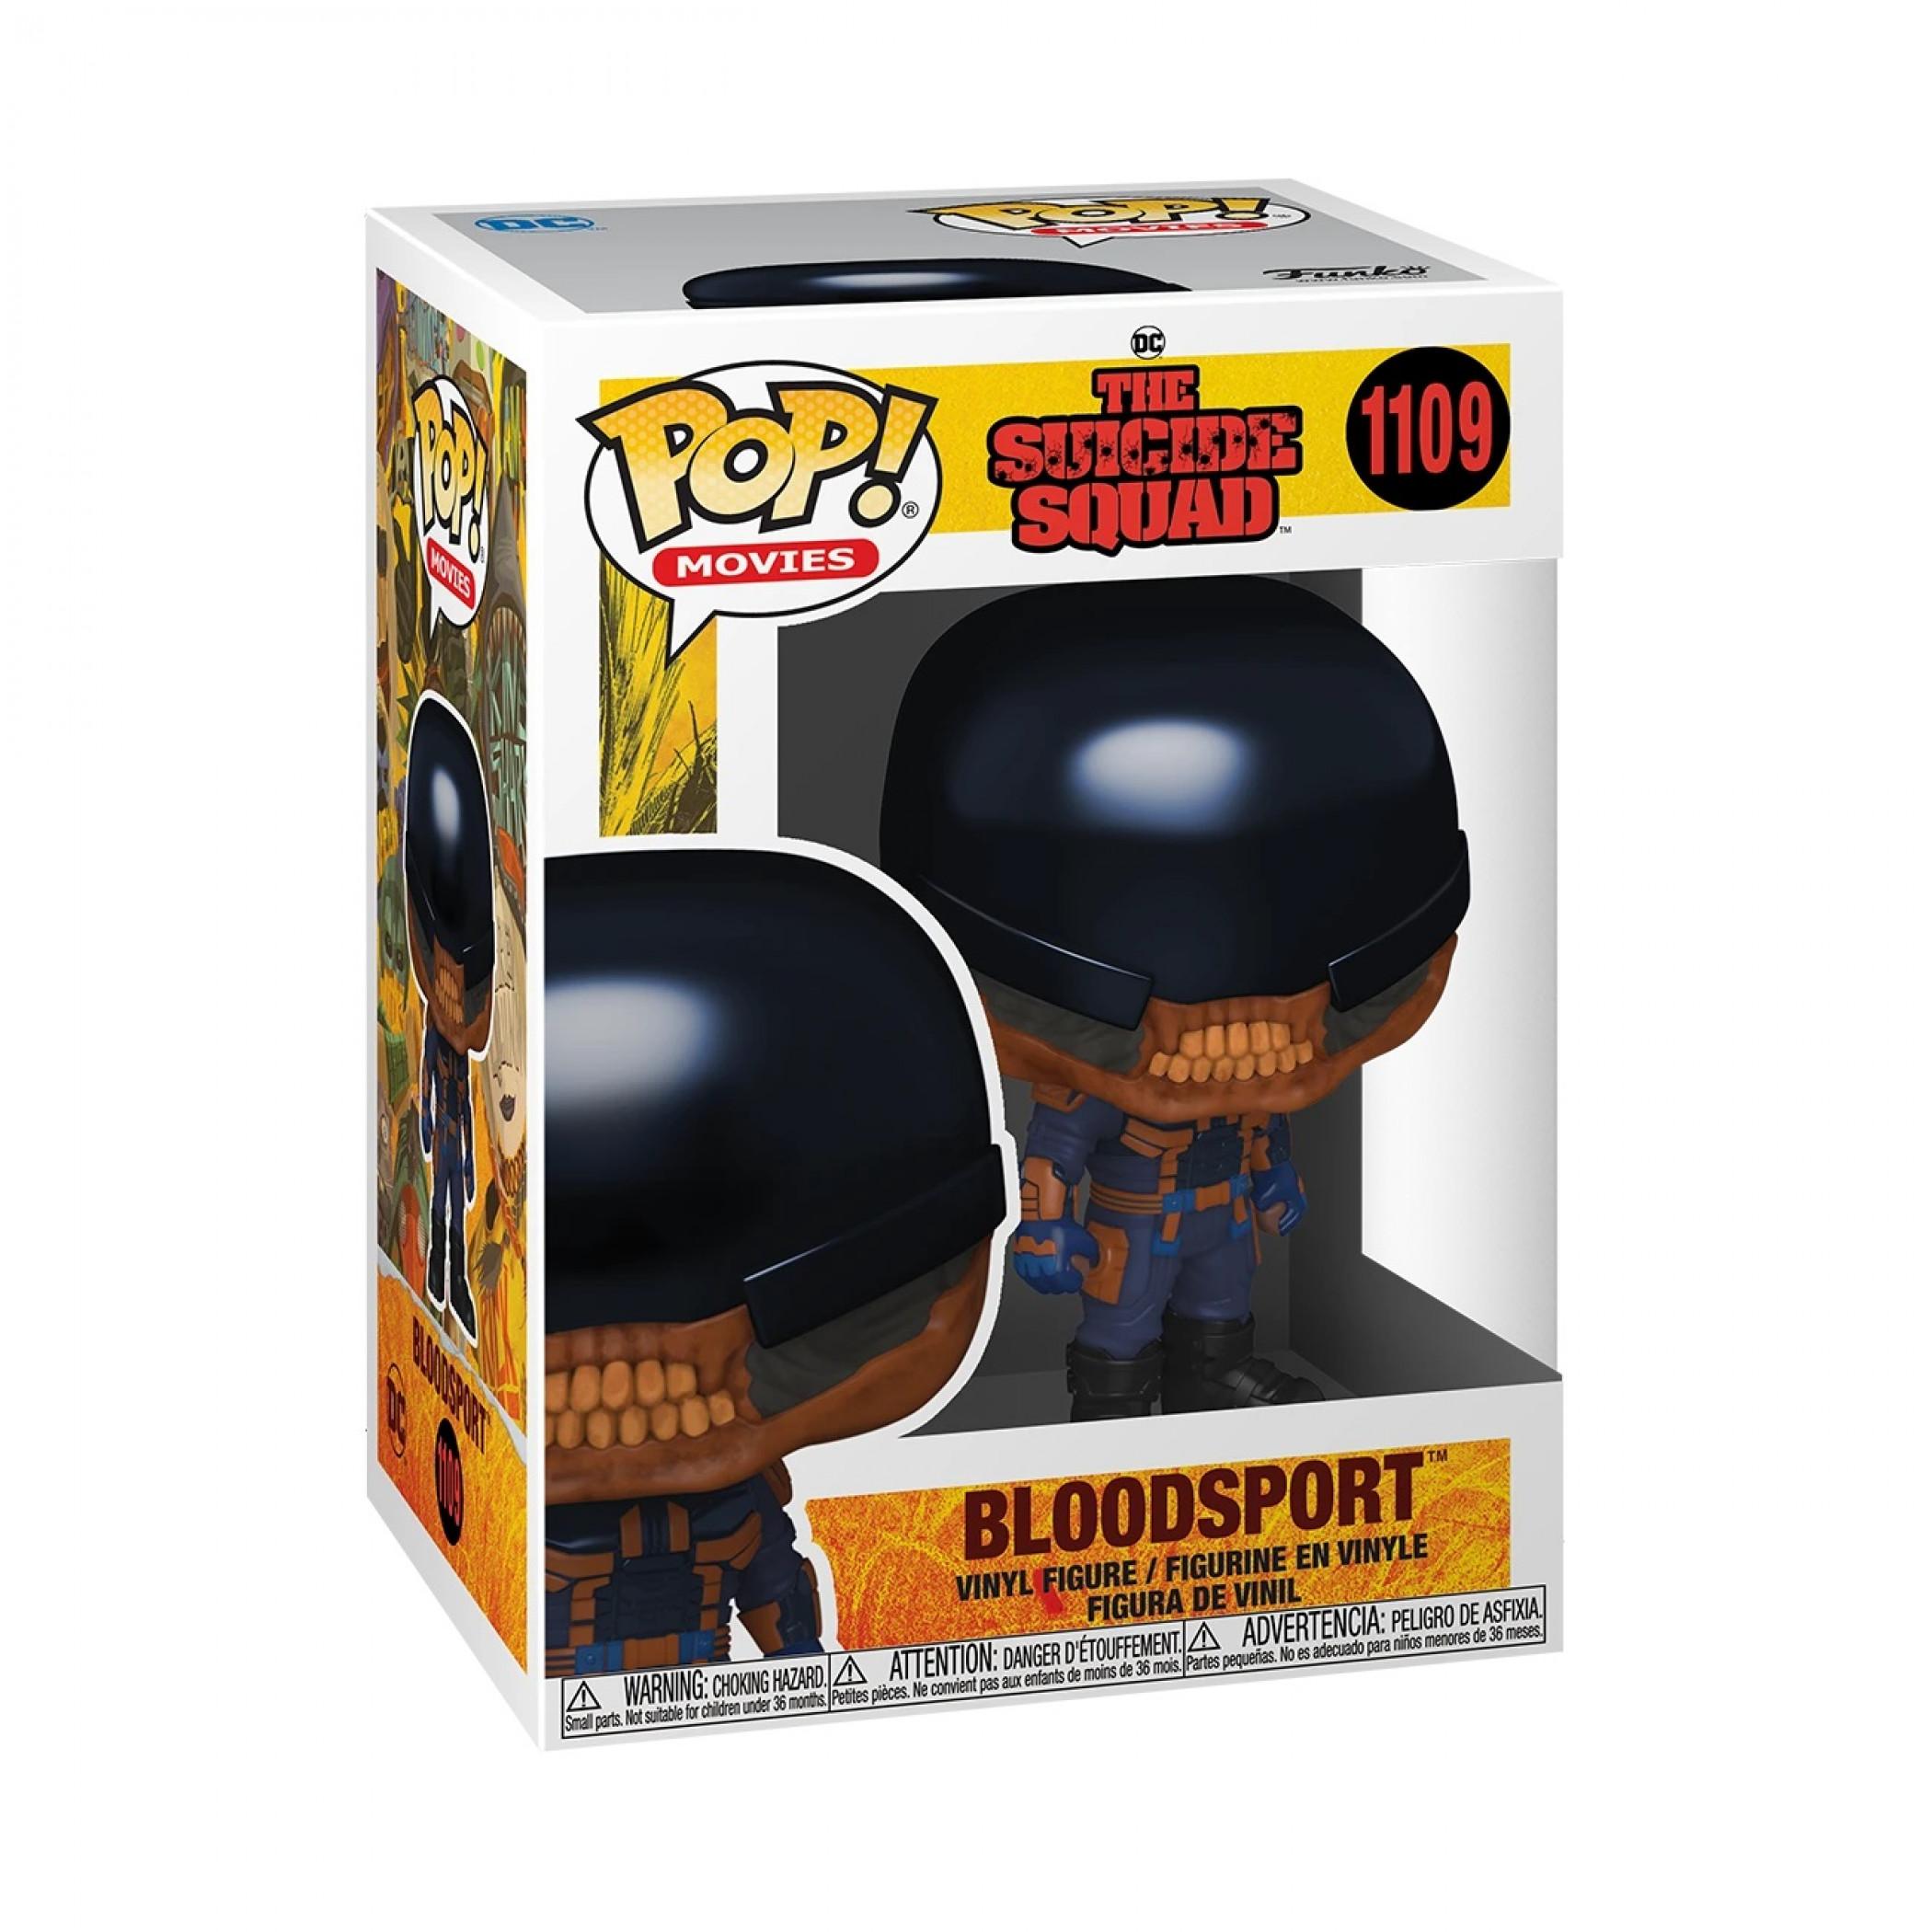 The Suicide Squad Bloodsport Funko Pop! Vinyl Figure